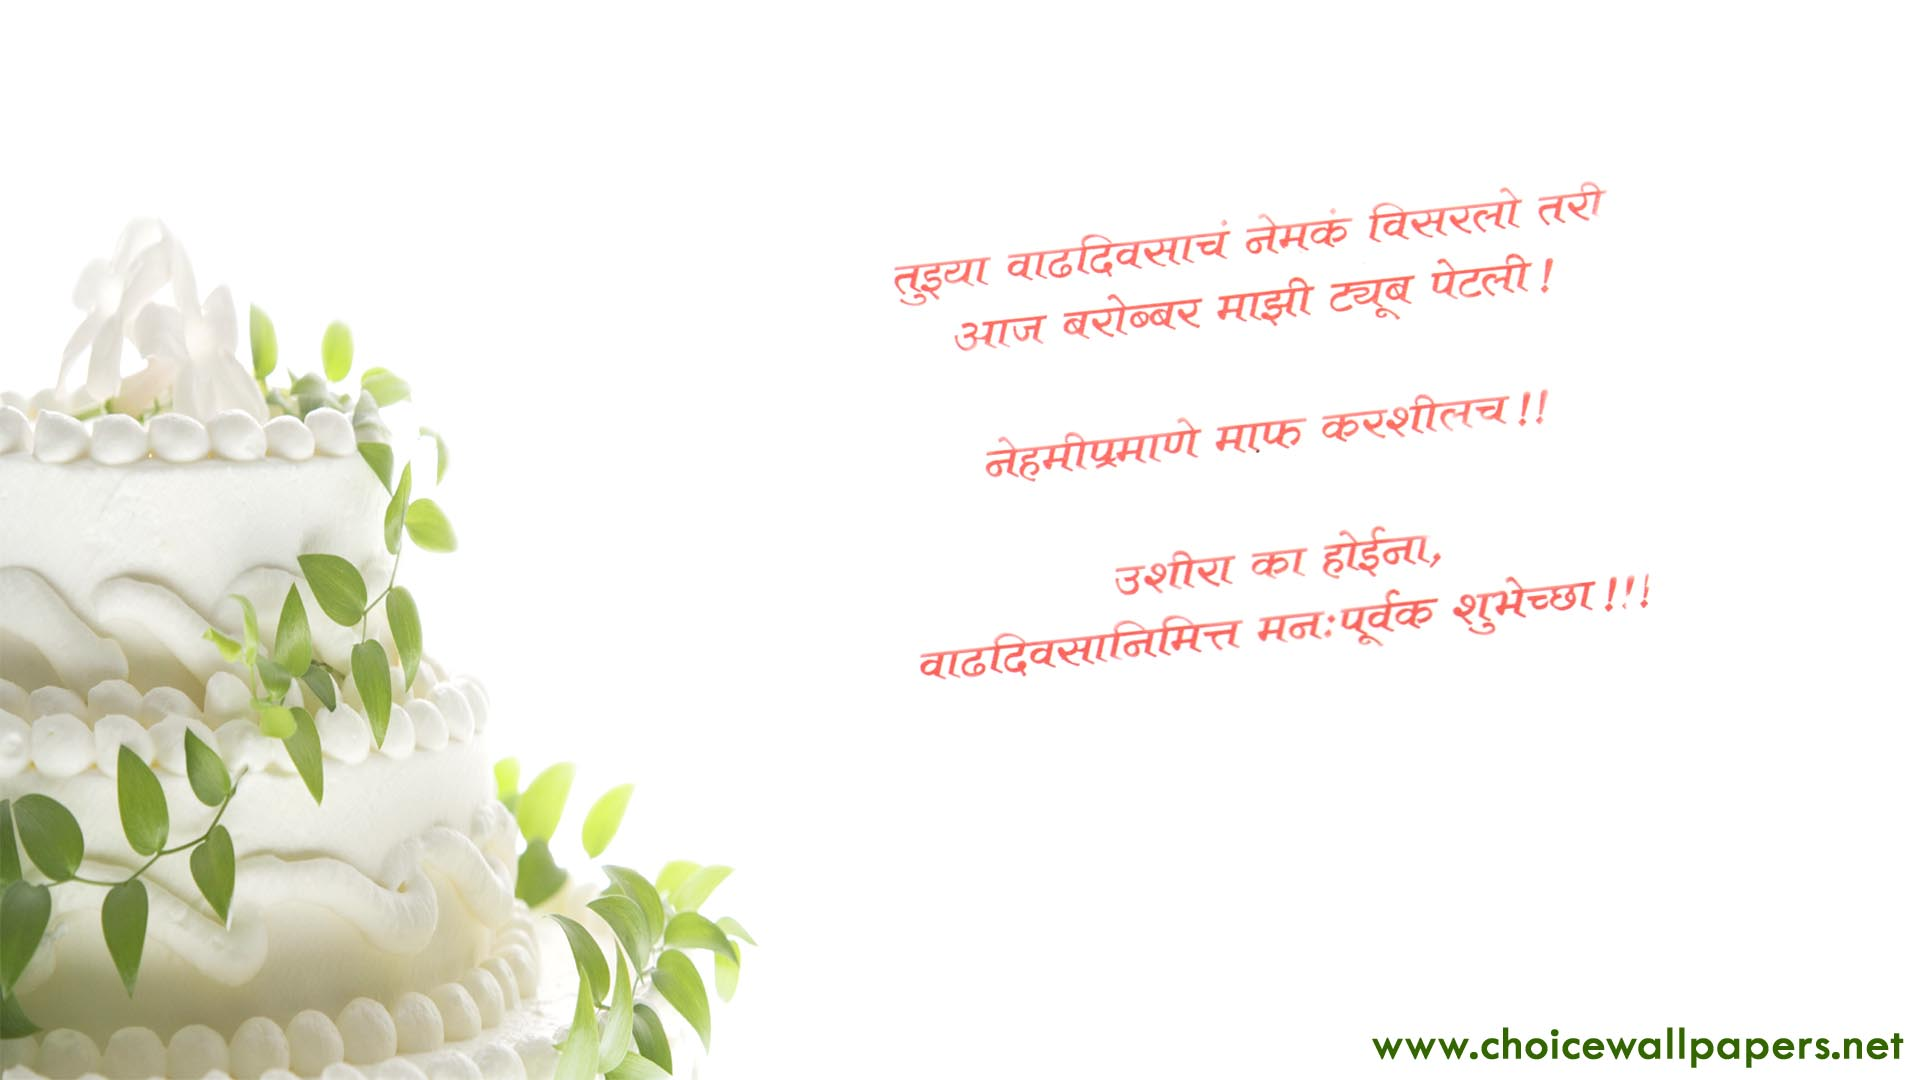 Birthday Greetings Wallpaper WallpaperSafari – Marathi Greetings Birthday